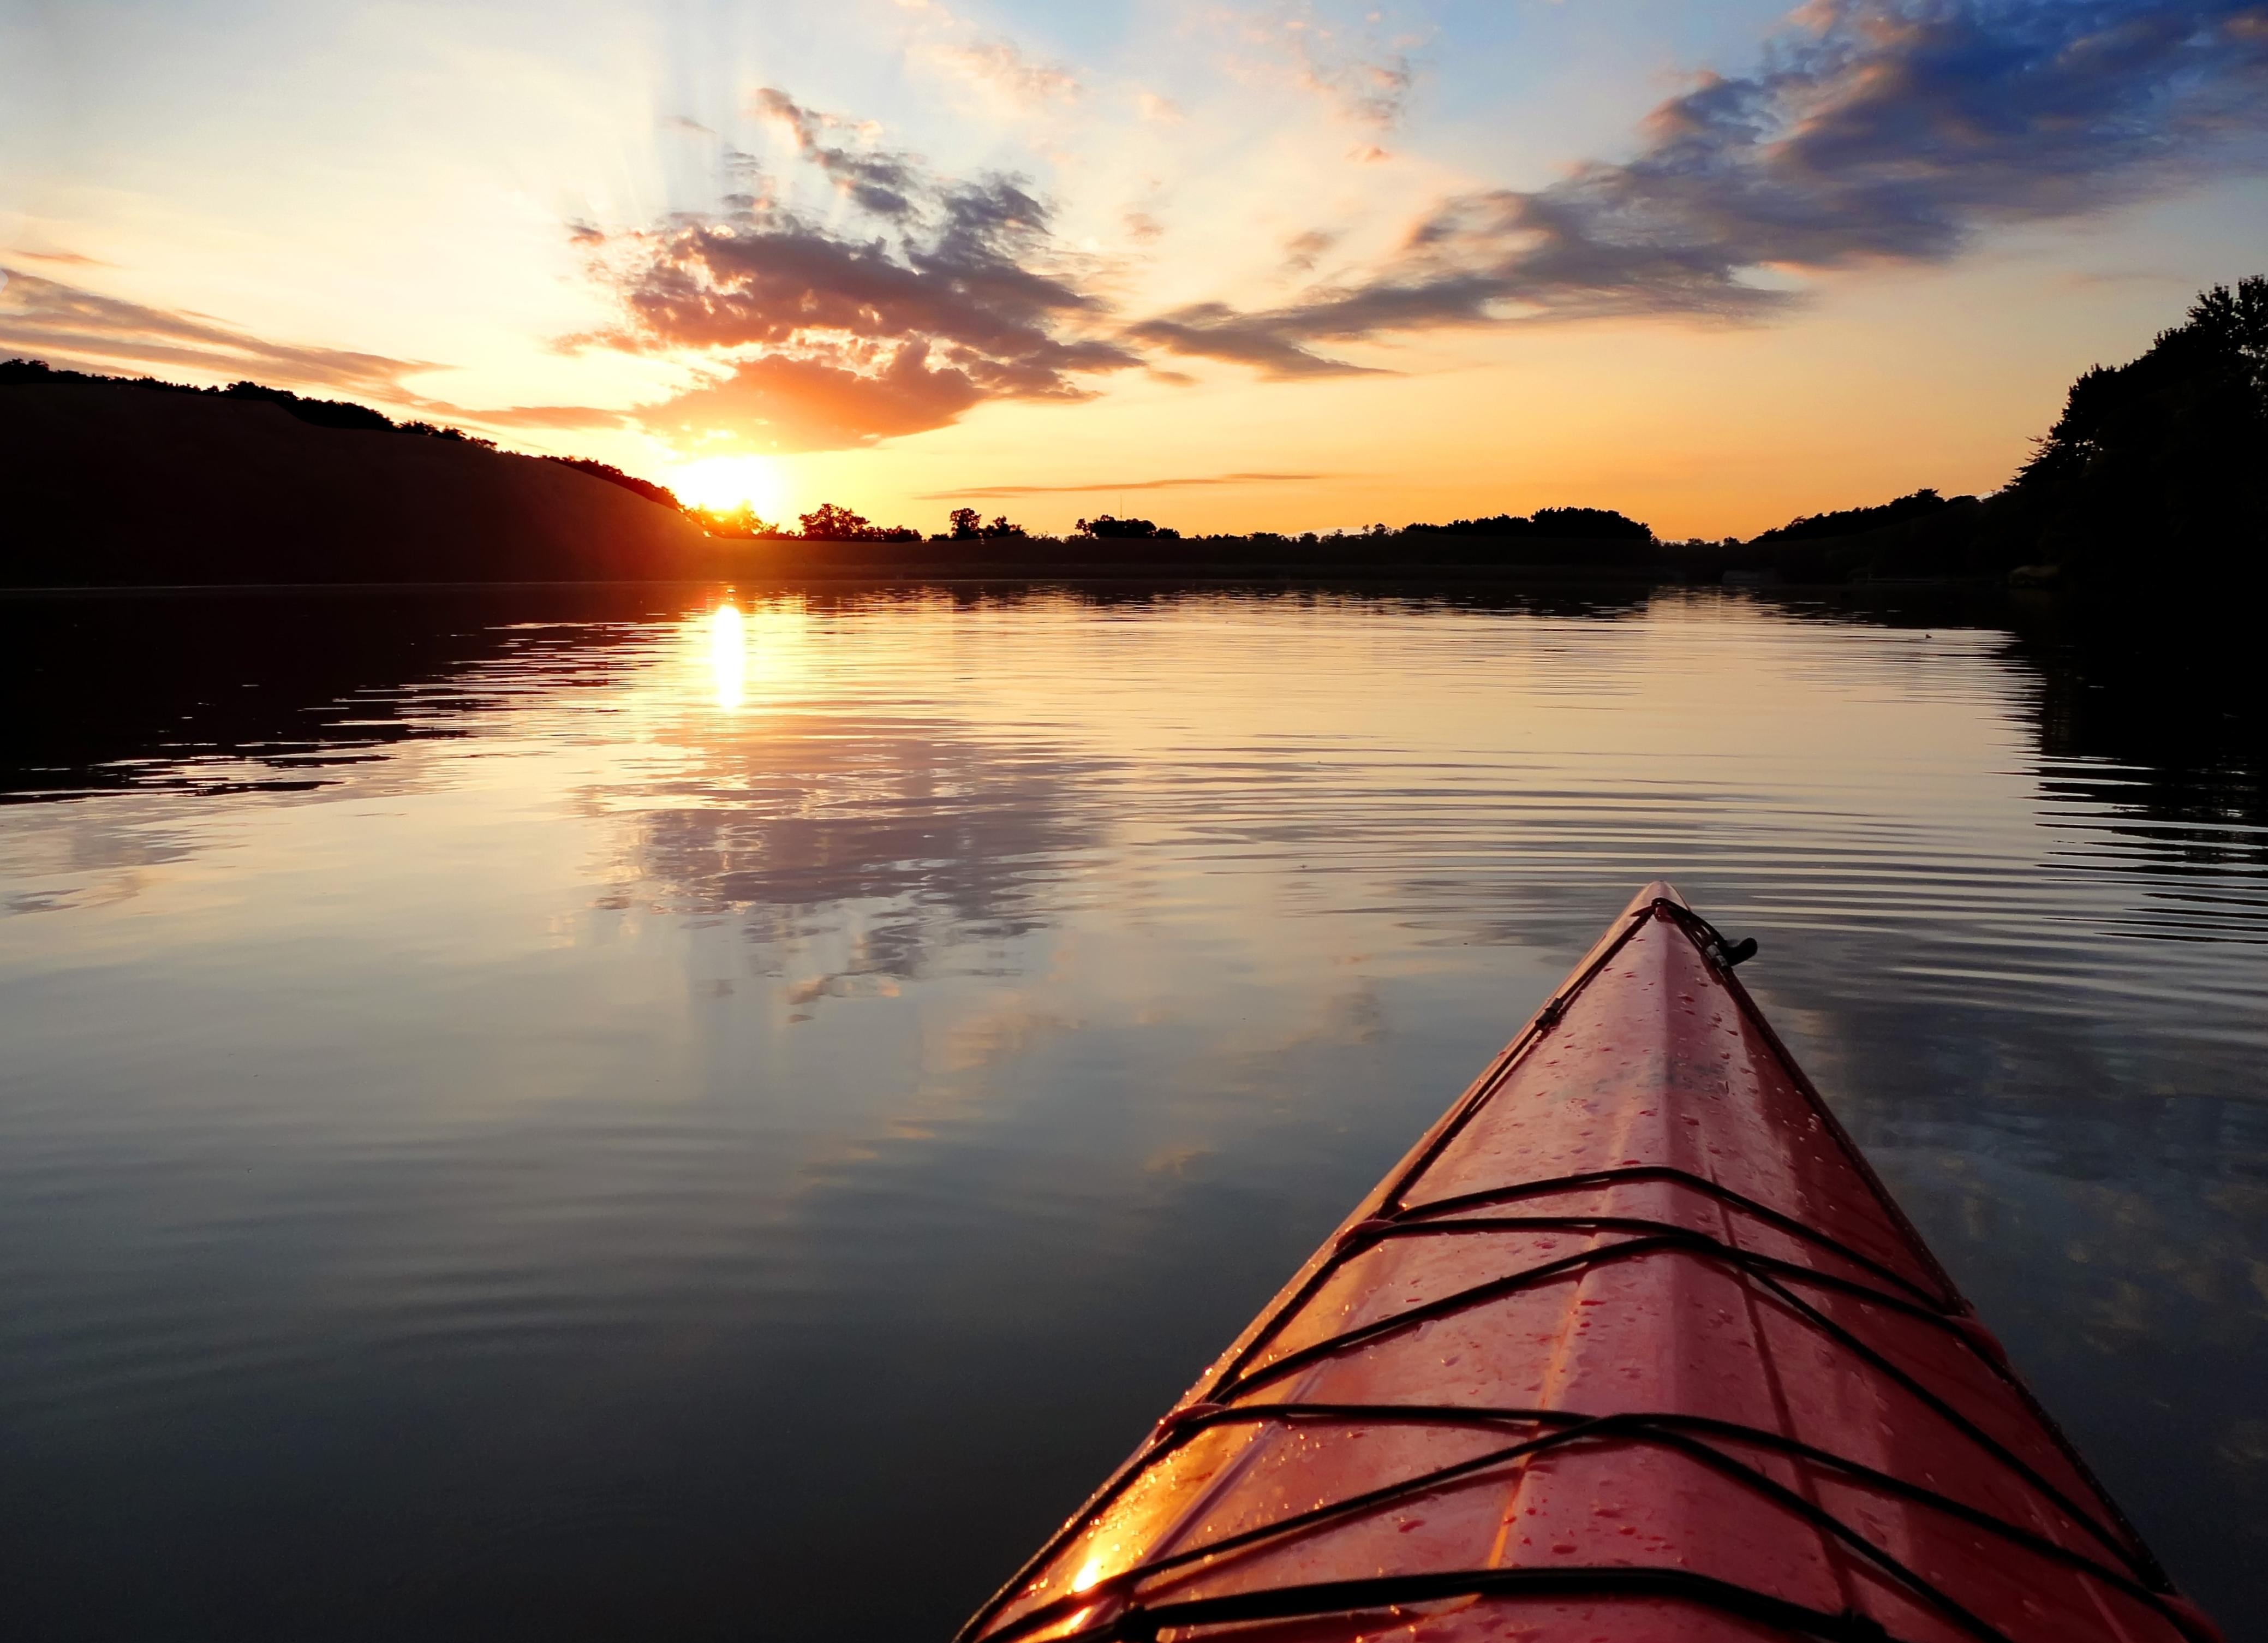 File:Kayak sunset Lake Ahquabi State Park.jpg - Wikimedia Commons